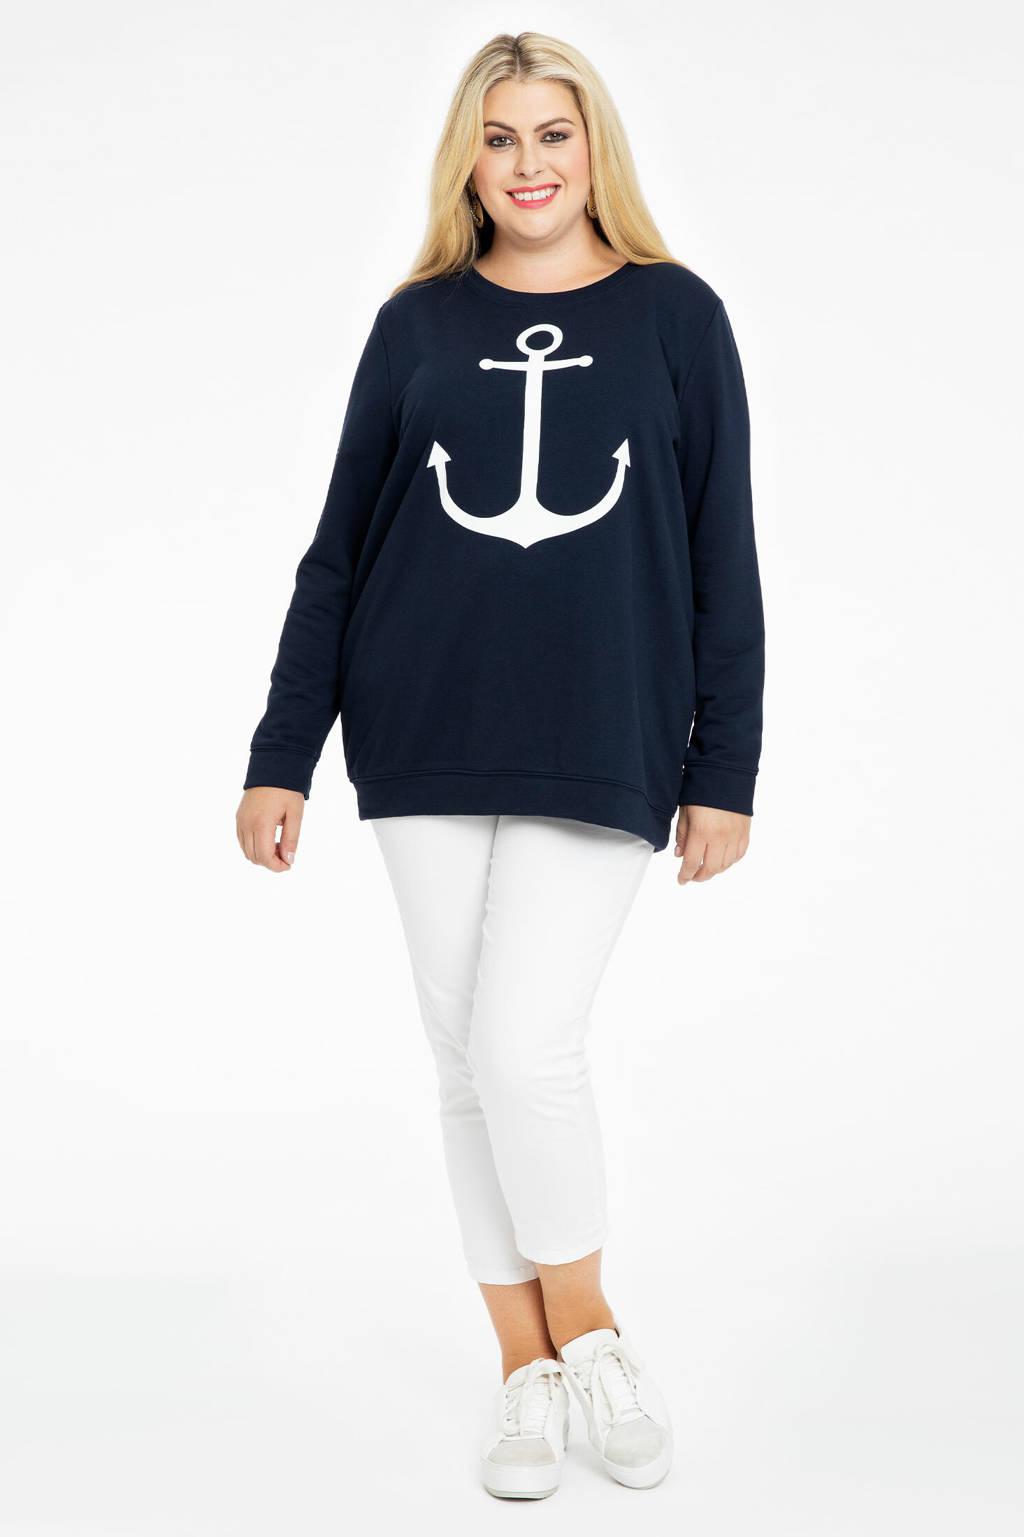 Yoek sweater met printopdruk donkerblauw/wit, Donkerblauw/wit